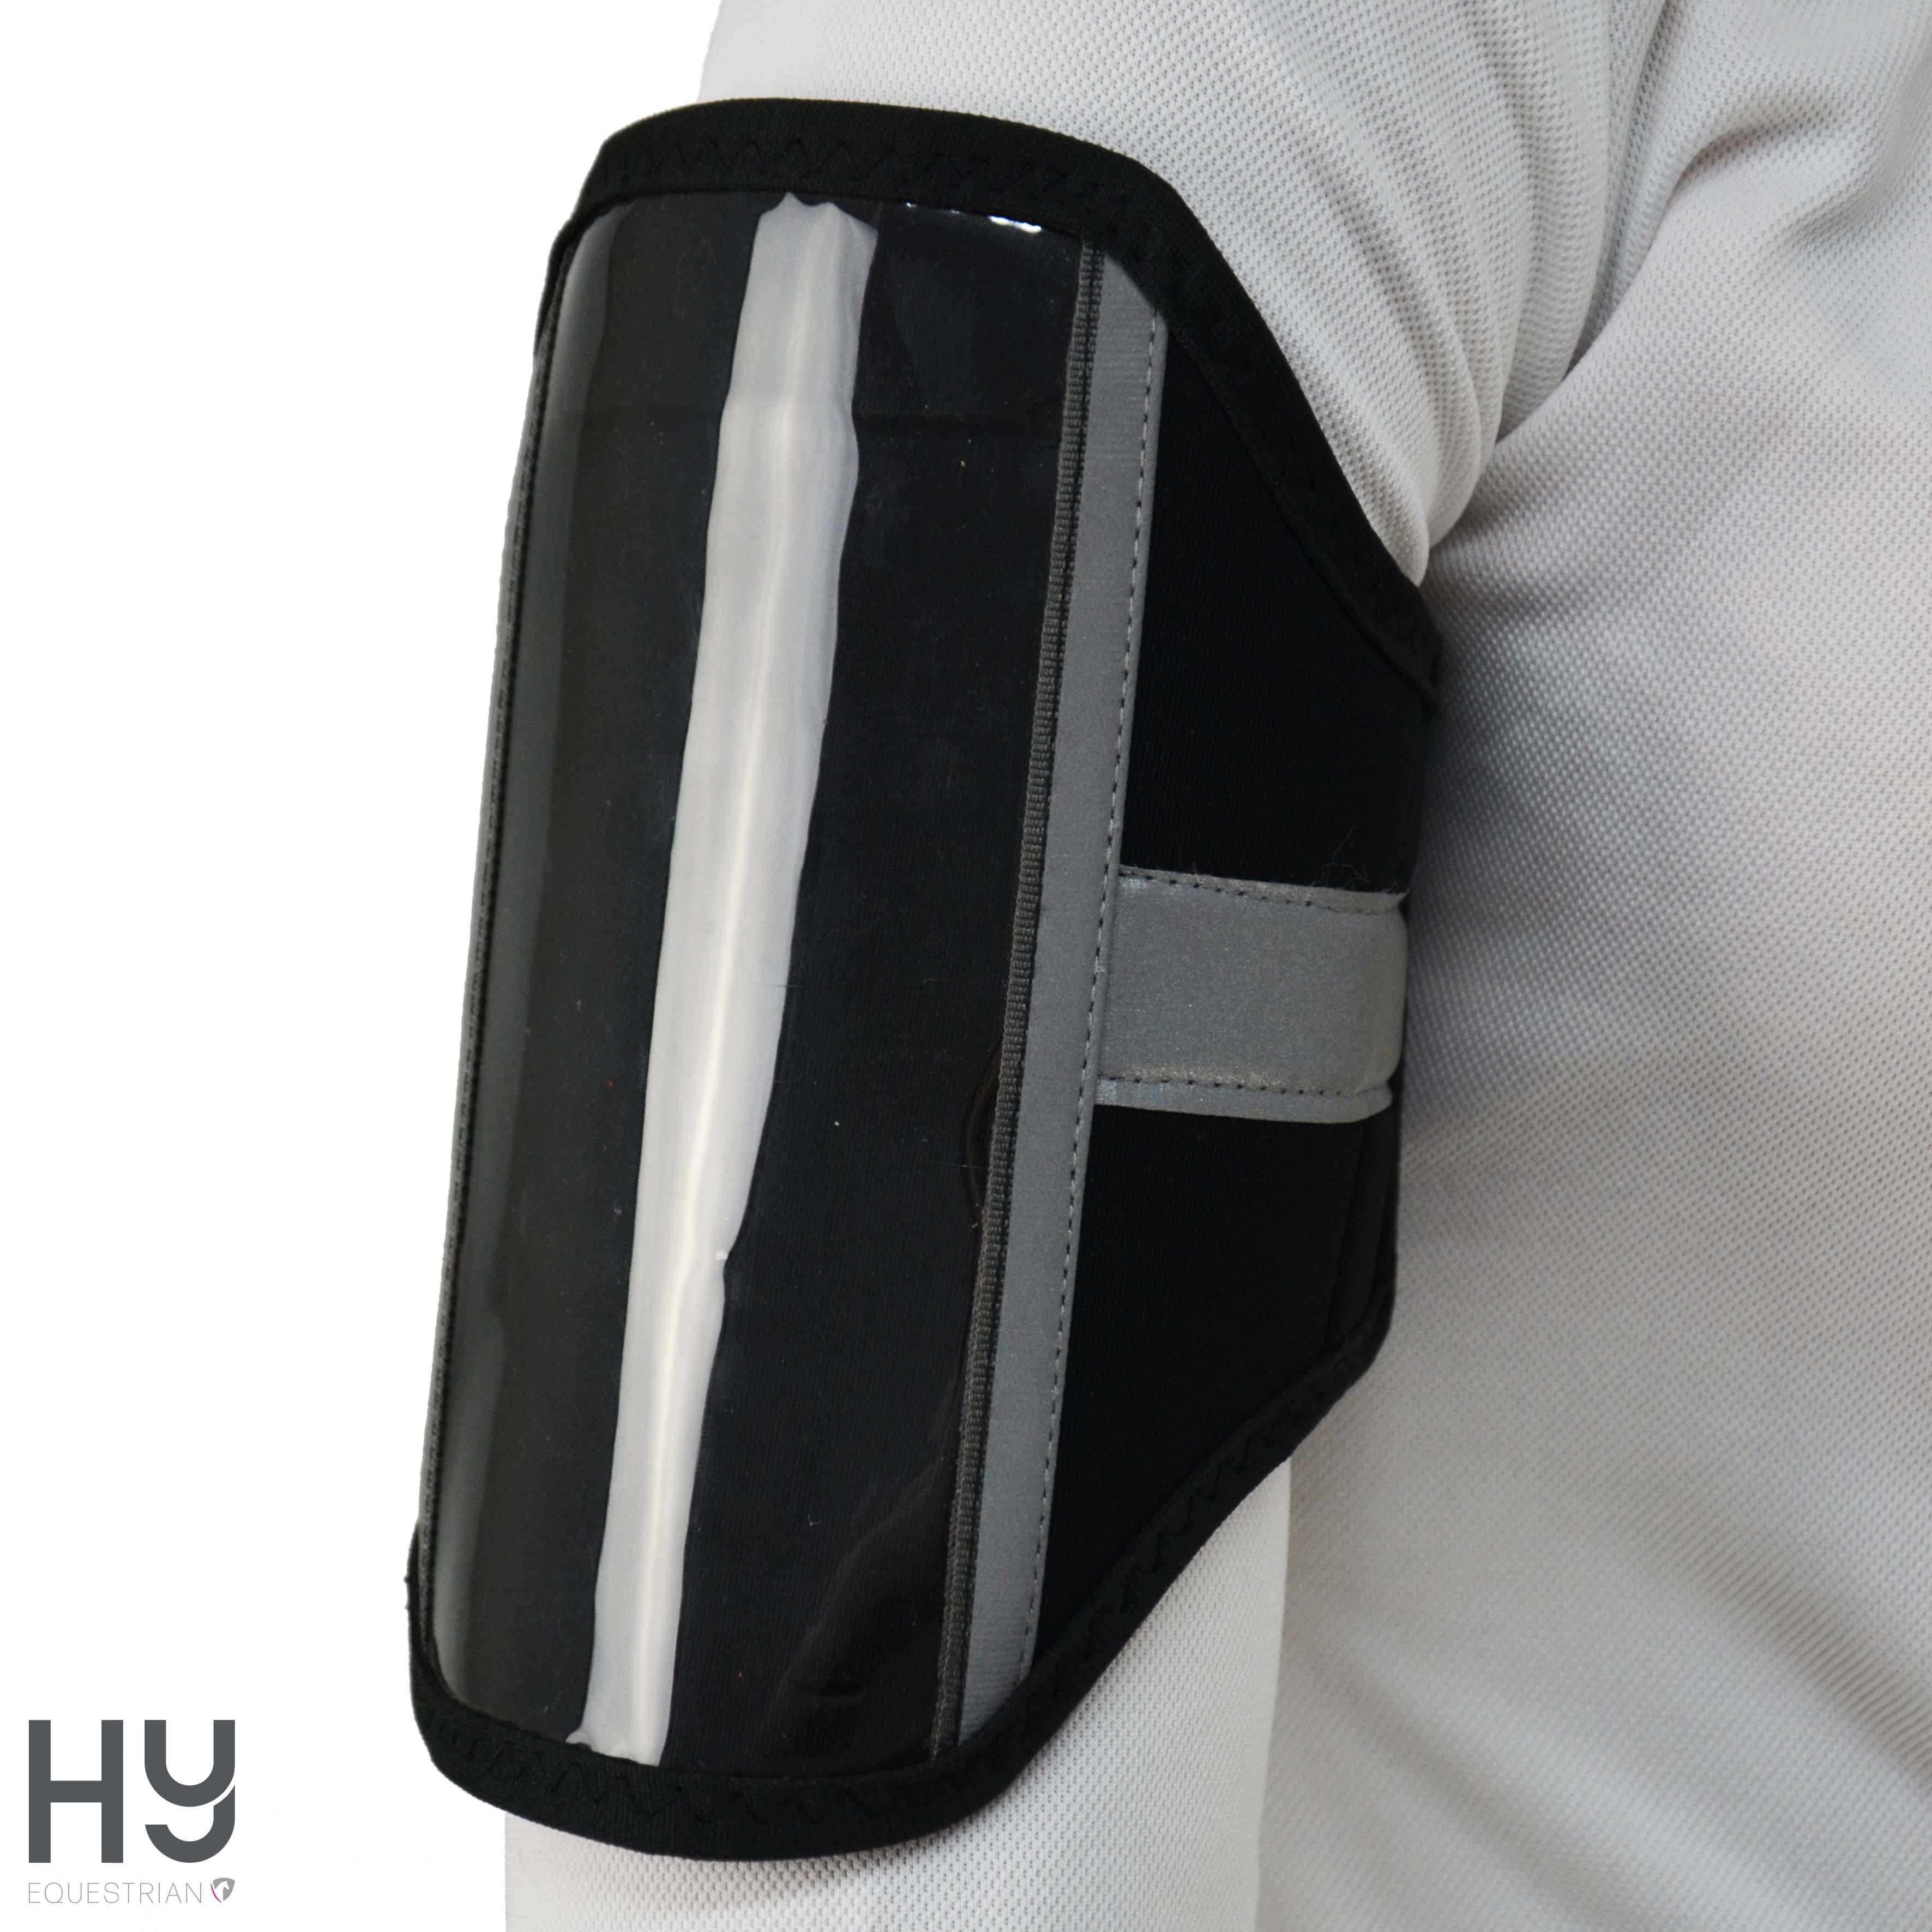 Silva Flash Mobile Phone Holder